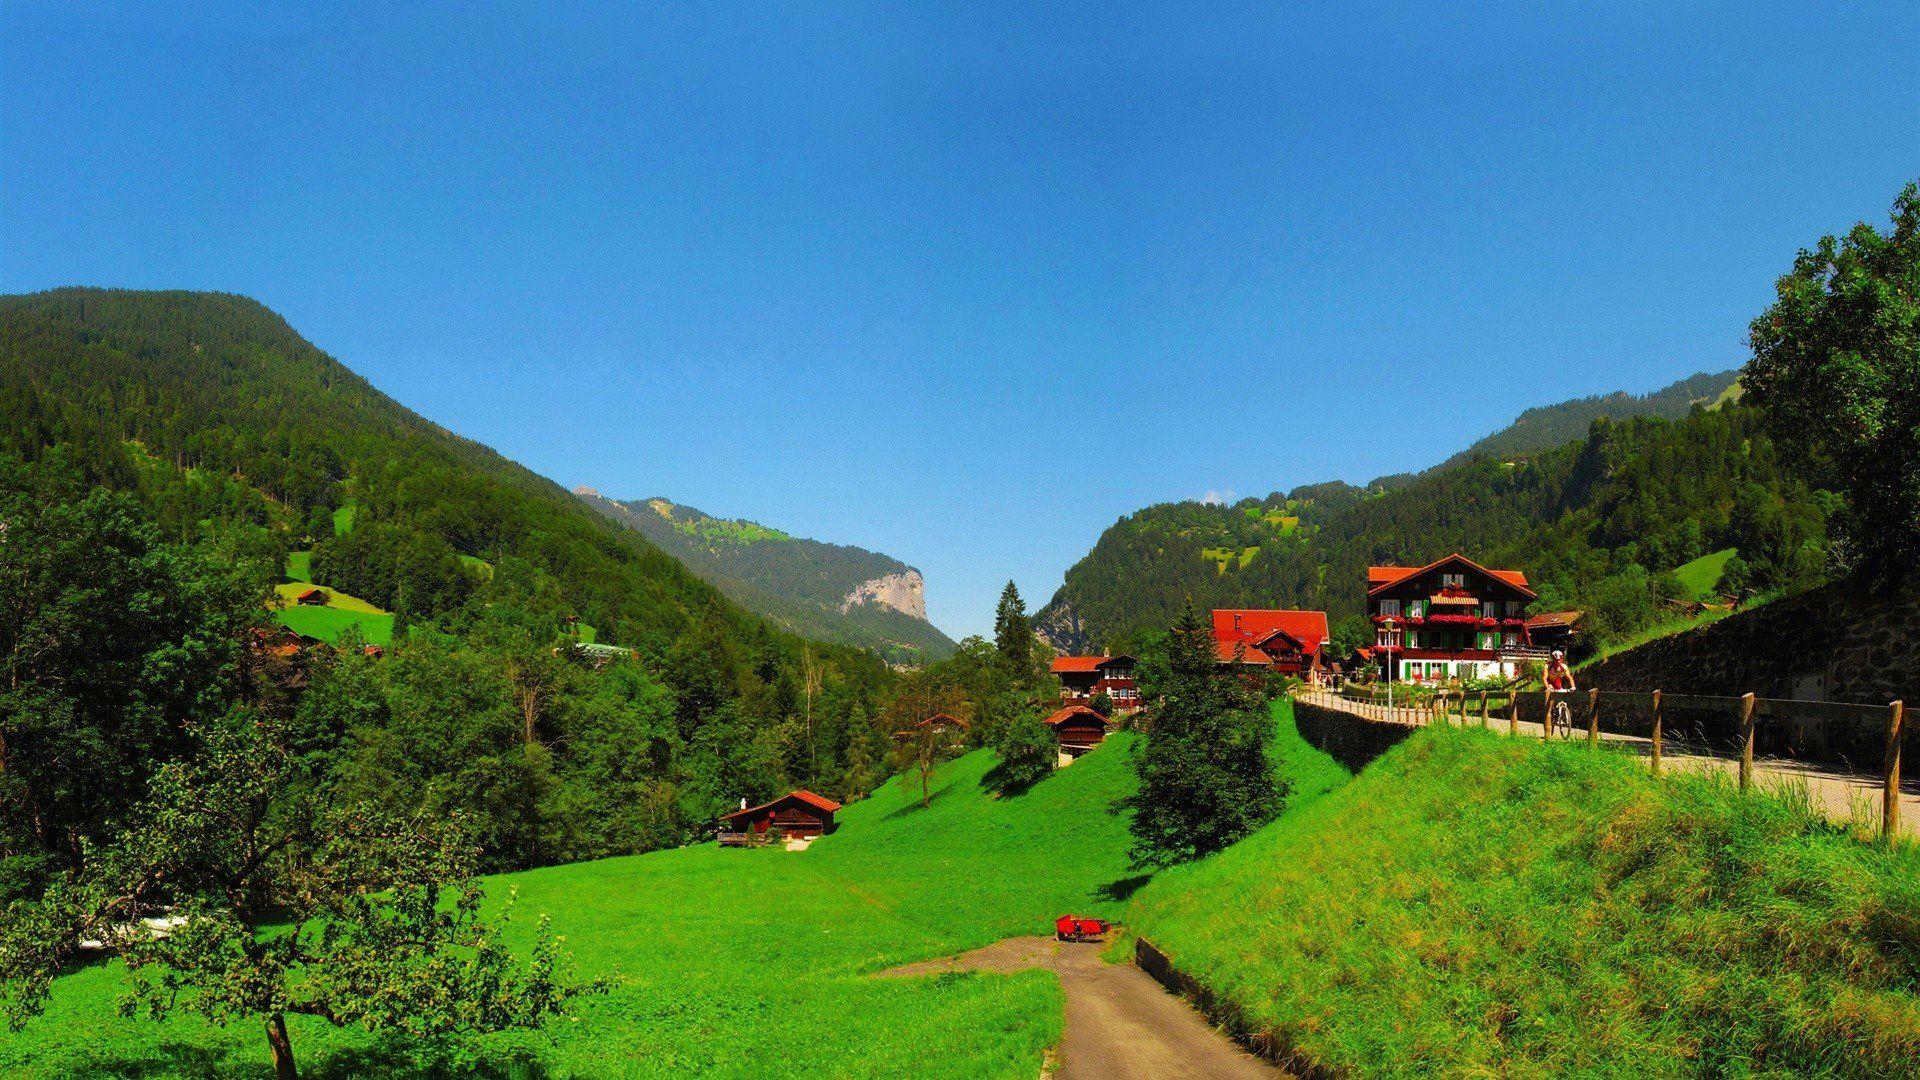 Switzerland Landscape Wallpaper Bing Images Landscape Wallpaper Landscape Scenery